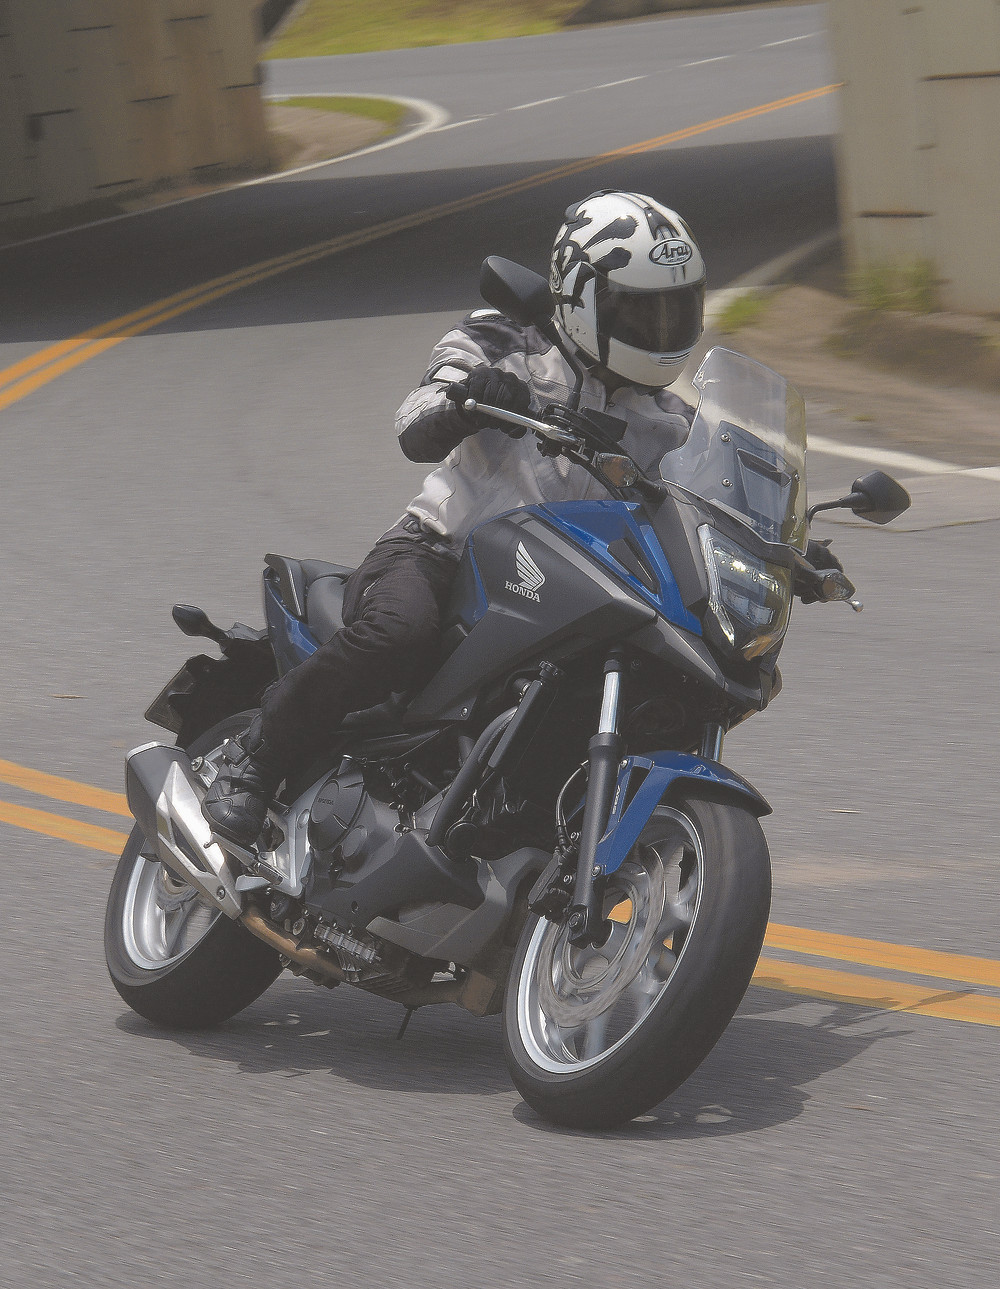 Honda NC 750X fazendo curva